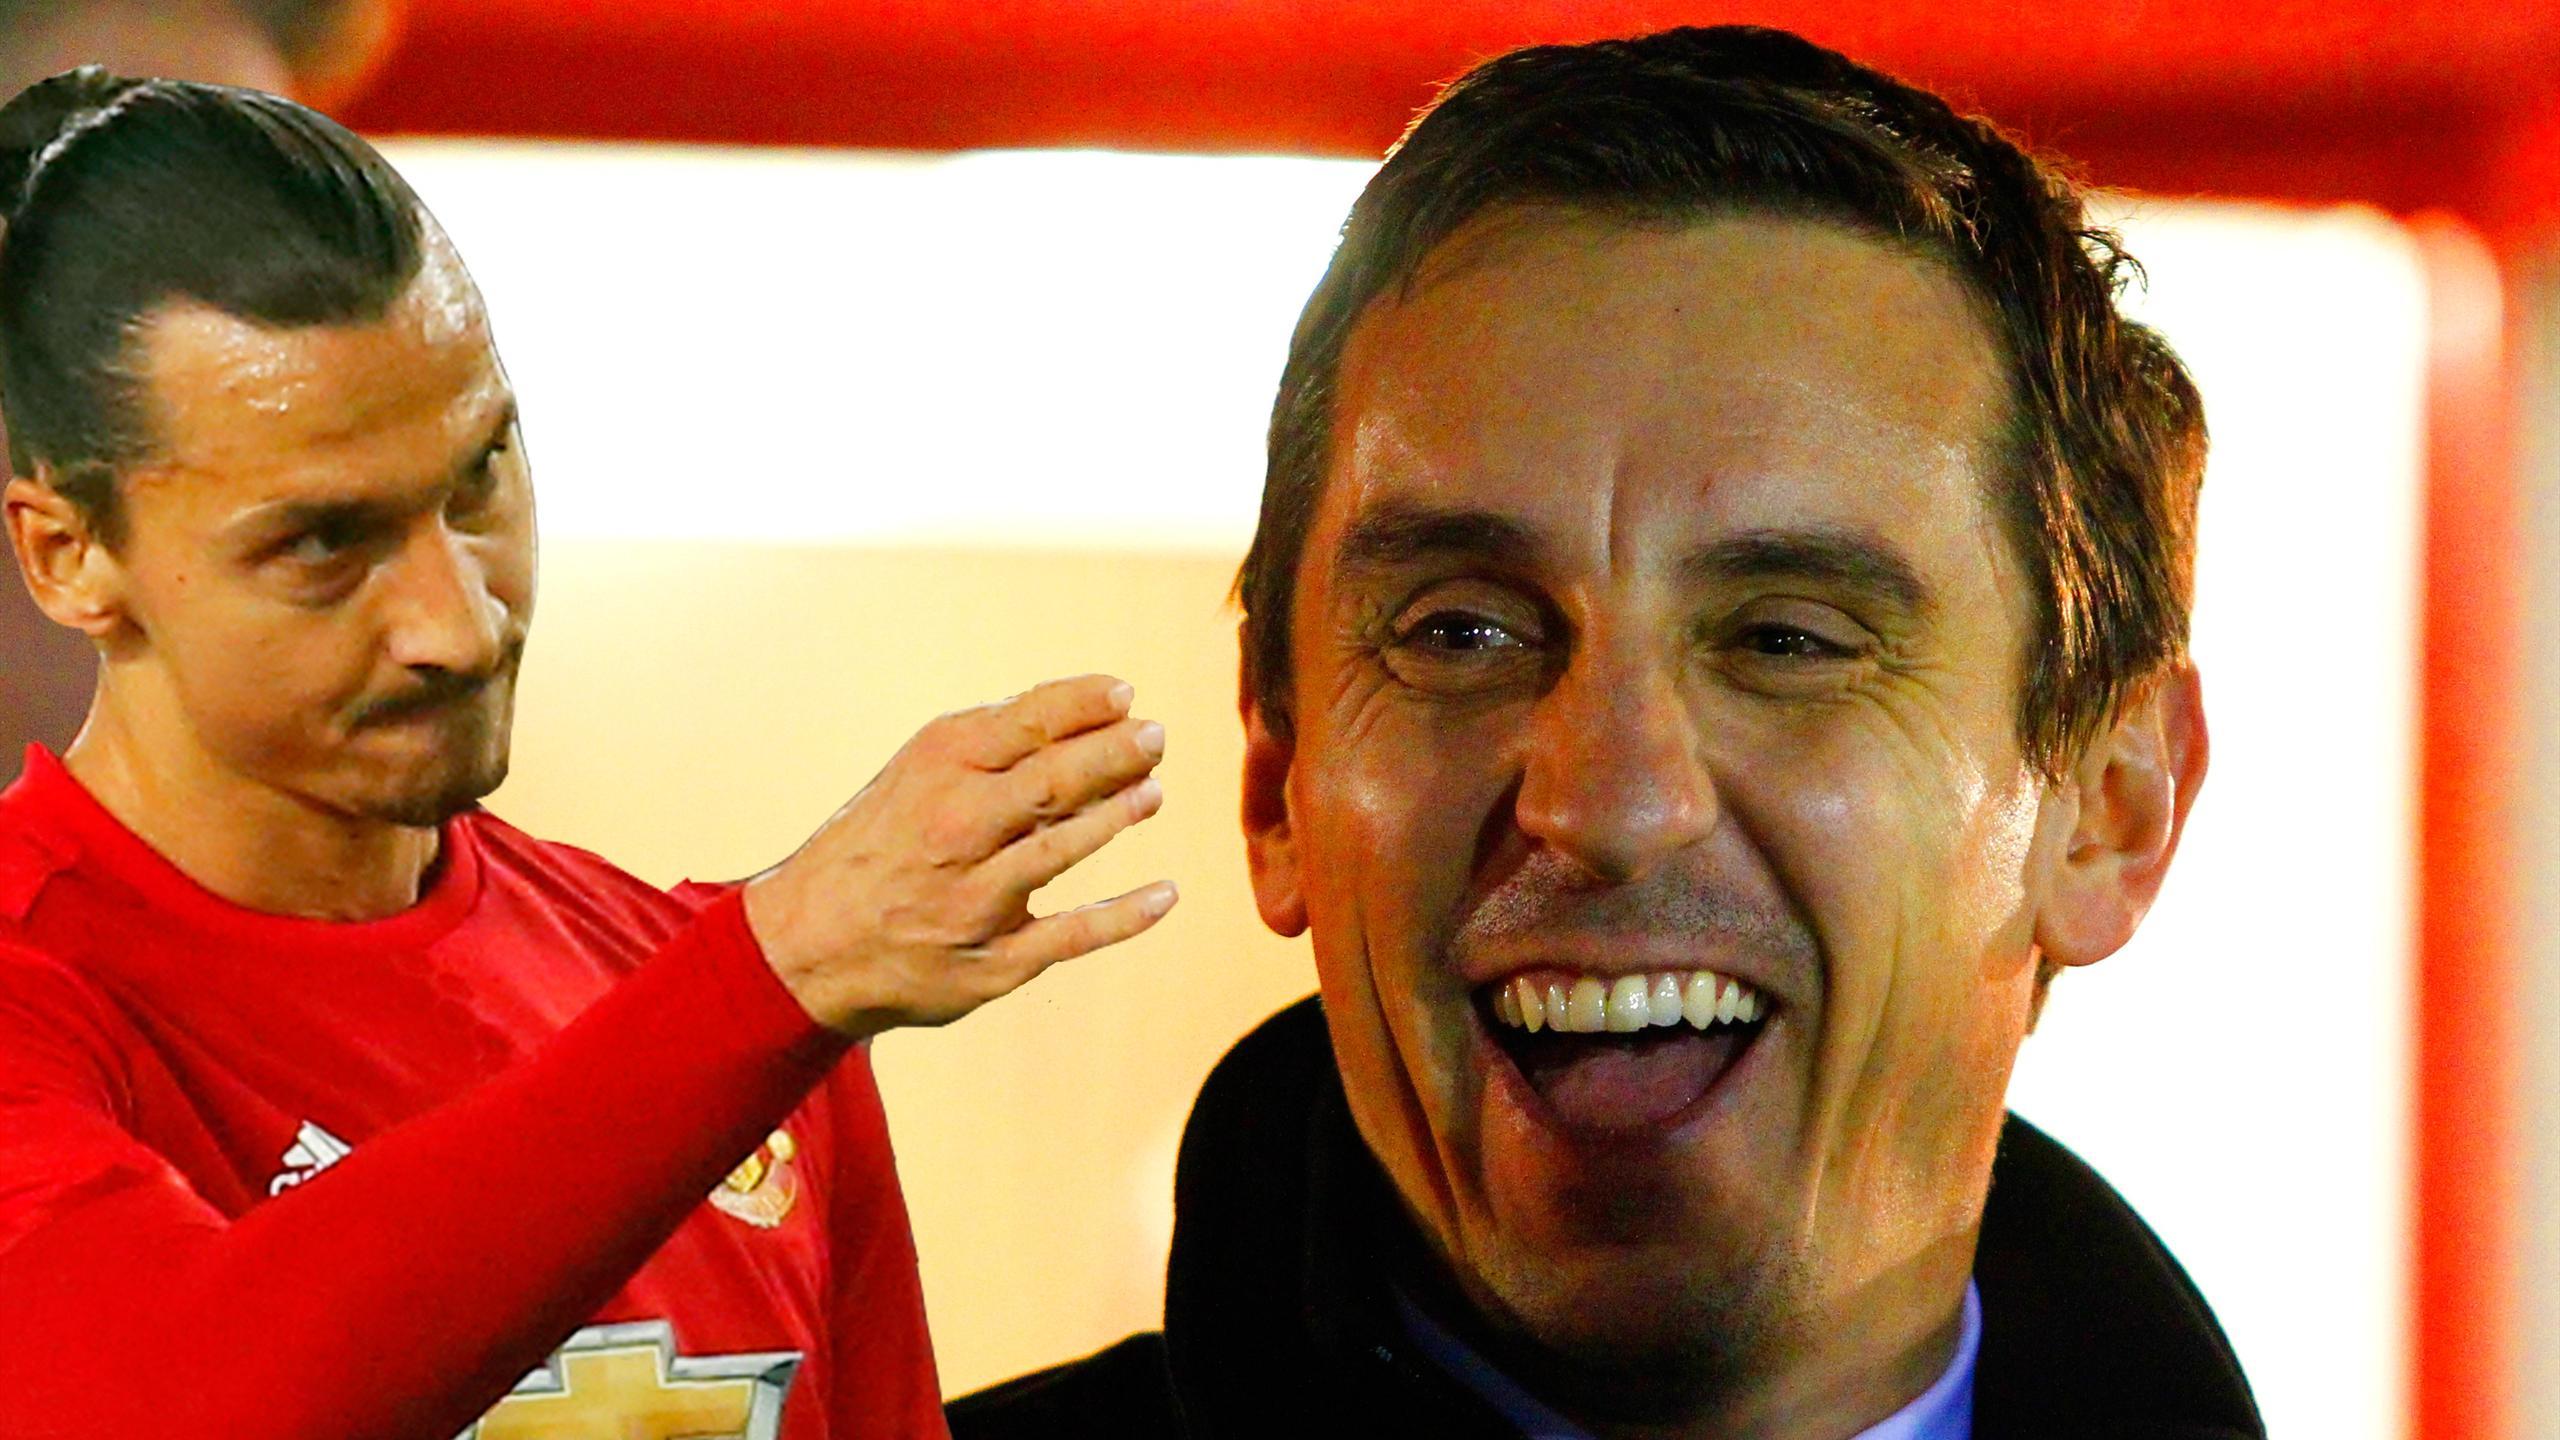 Manchester United striker Zlatan Ibrahimovic and Gary Neville